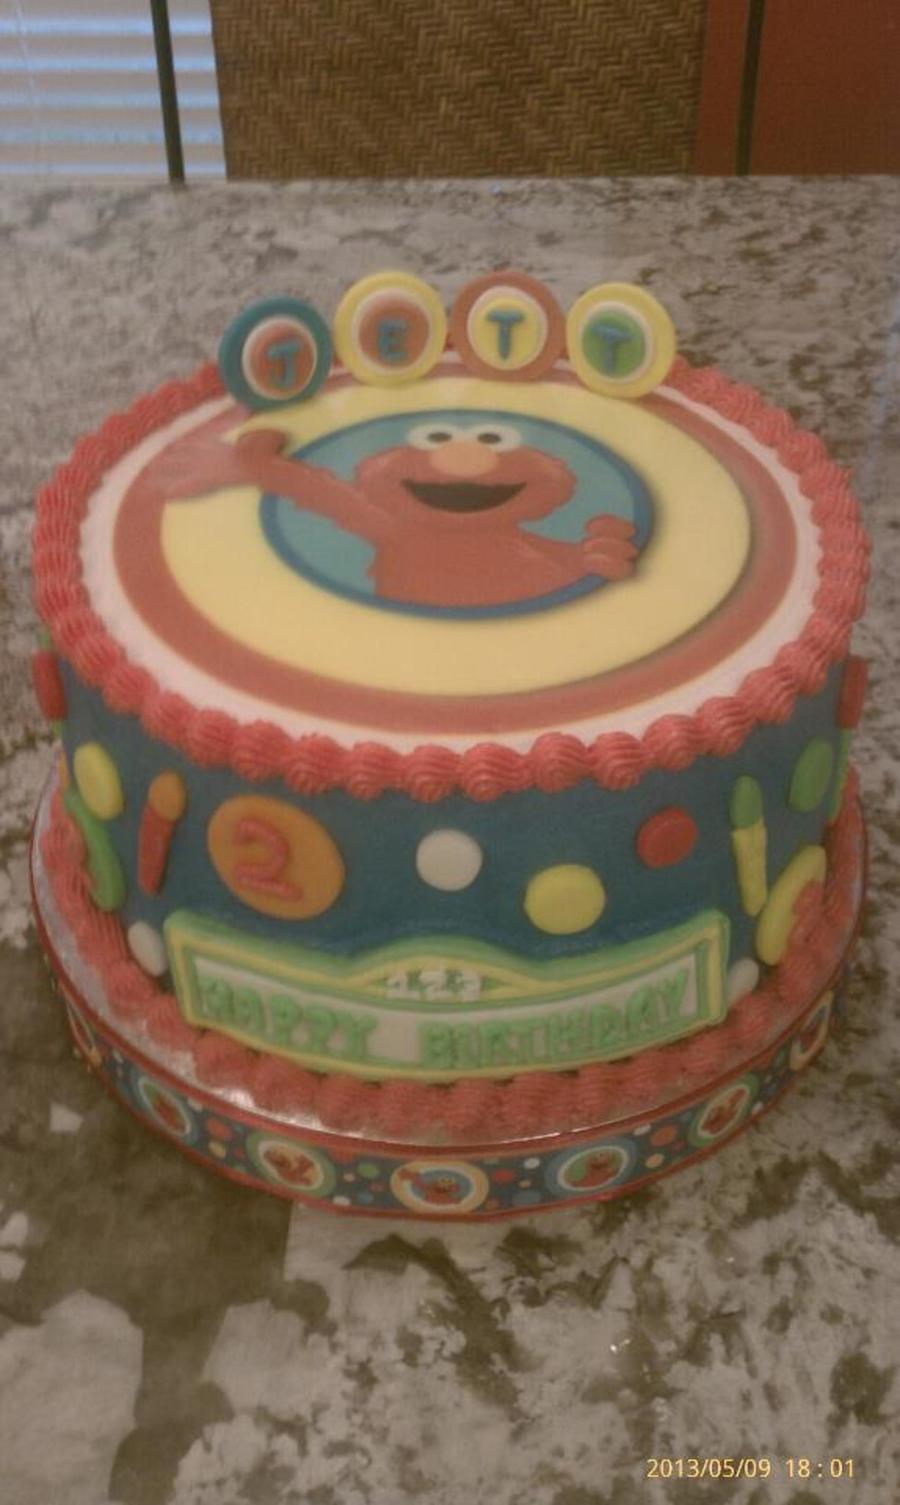 Elmo Birthday Cake For The 2 Yr Old Nephew Of A Friend Of Mine